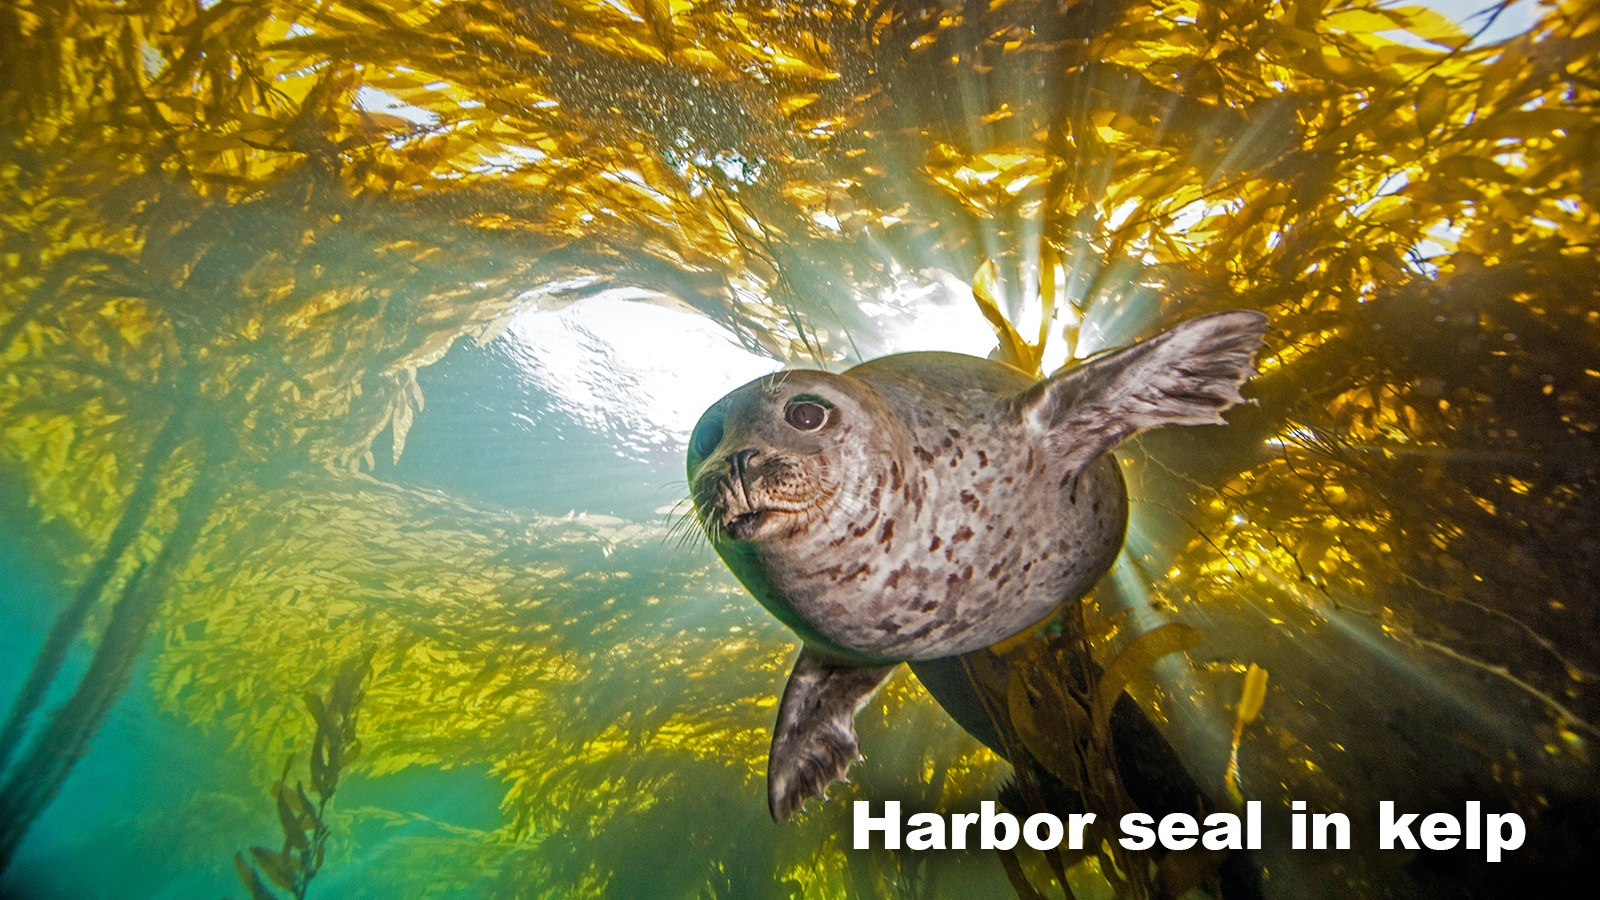 Marine Biome animal harbor seal